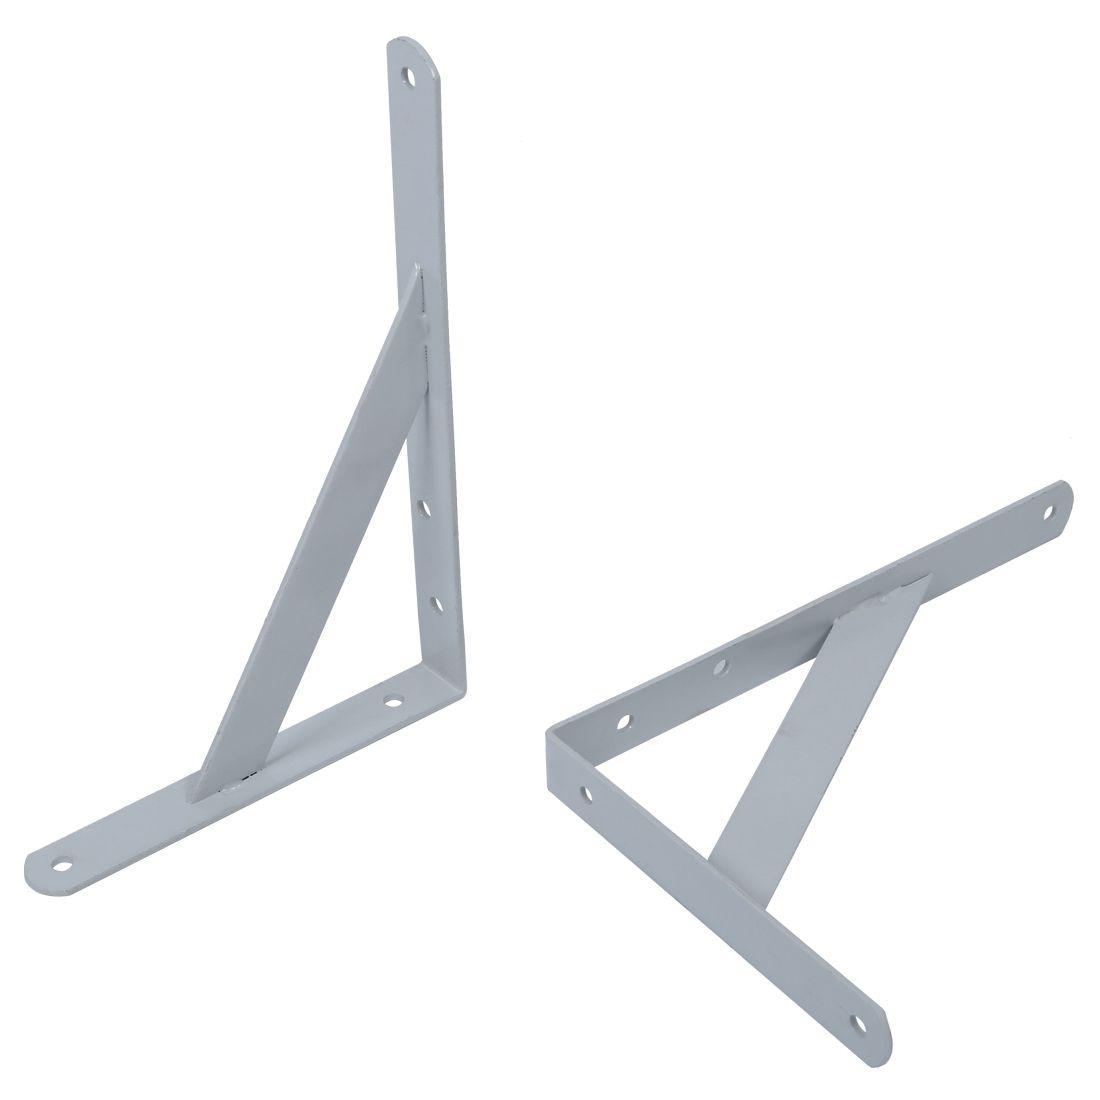 10PCS Heavy Duty White Decorative Shelf Brackets Wall Mounting Bracket Shelf Support Frame